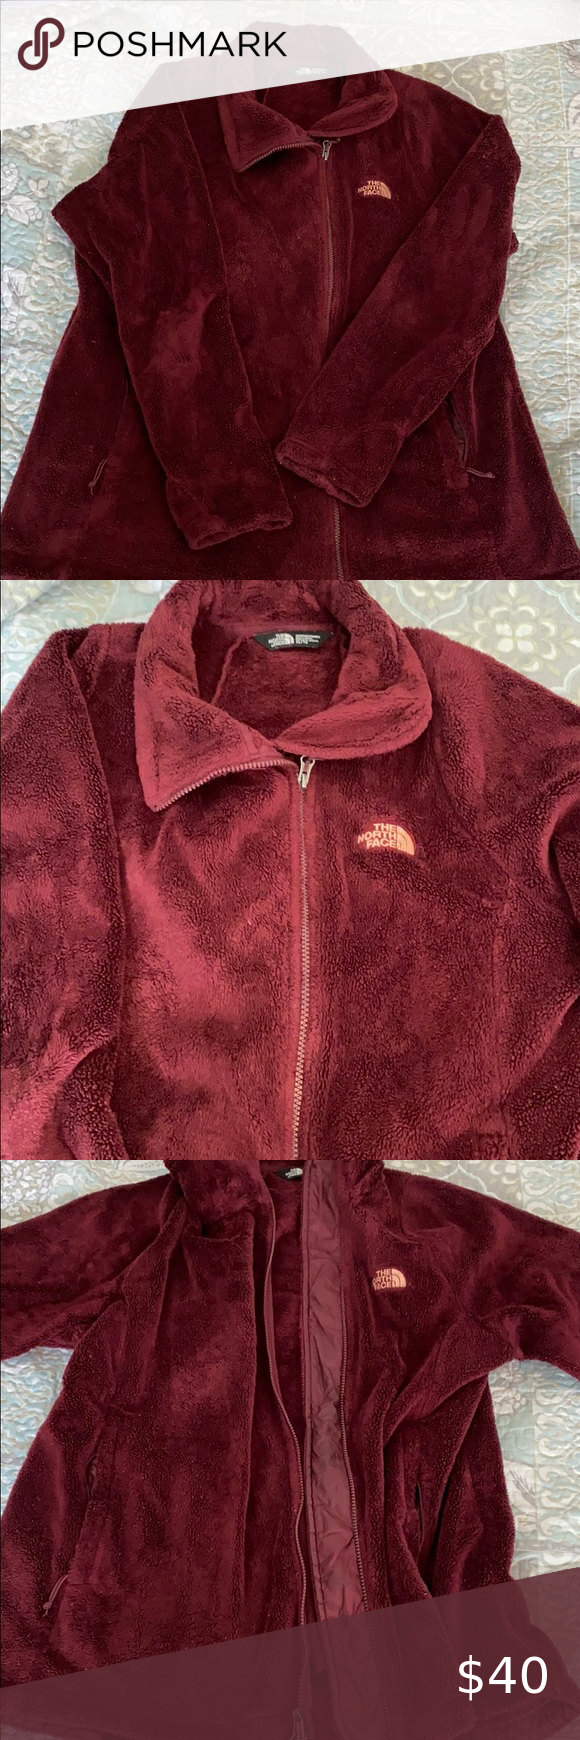 The North Face Fleece Jacket Gently Used North Face Jacket In Burgundy Perfect Fleece Jacket For Fall Zip Pock North Face Fleece Jacket Fashion Fleece Jacket [ 1740 x 580 Pixel ]